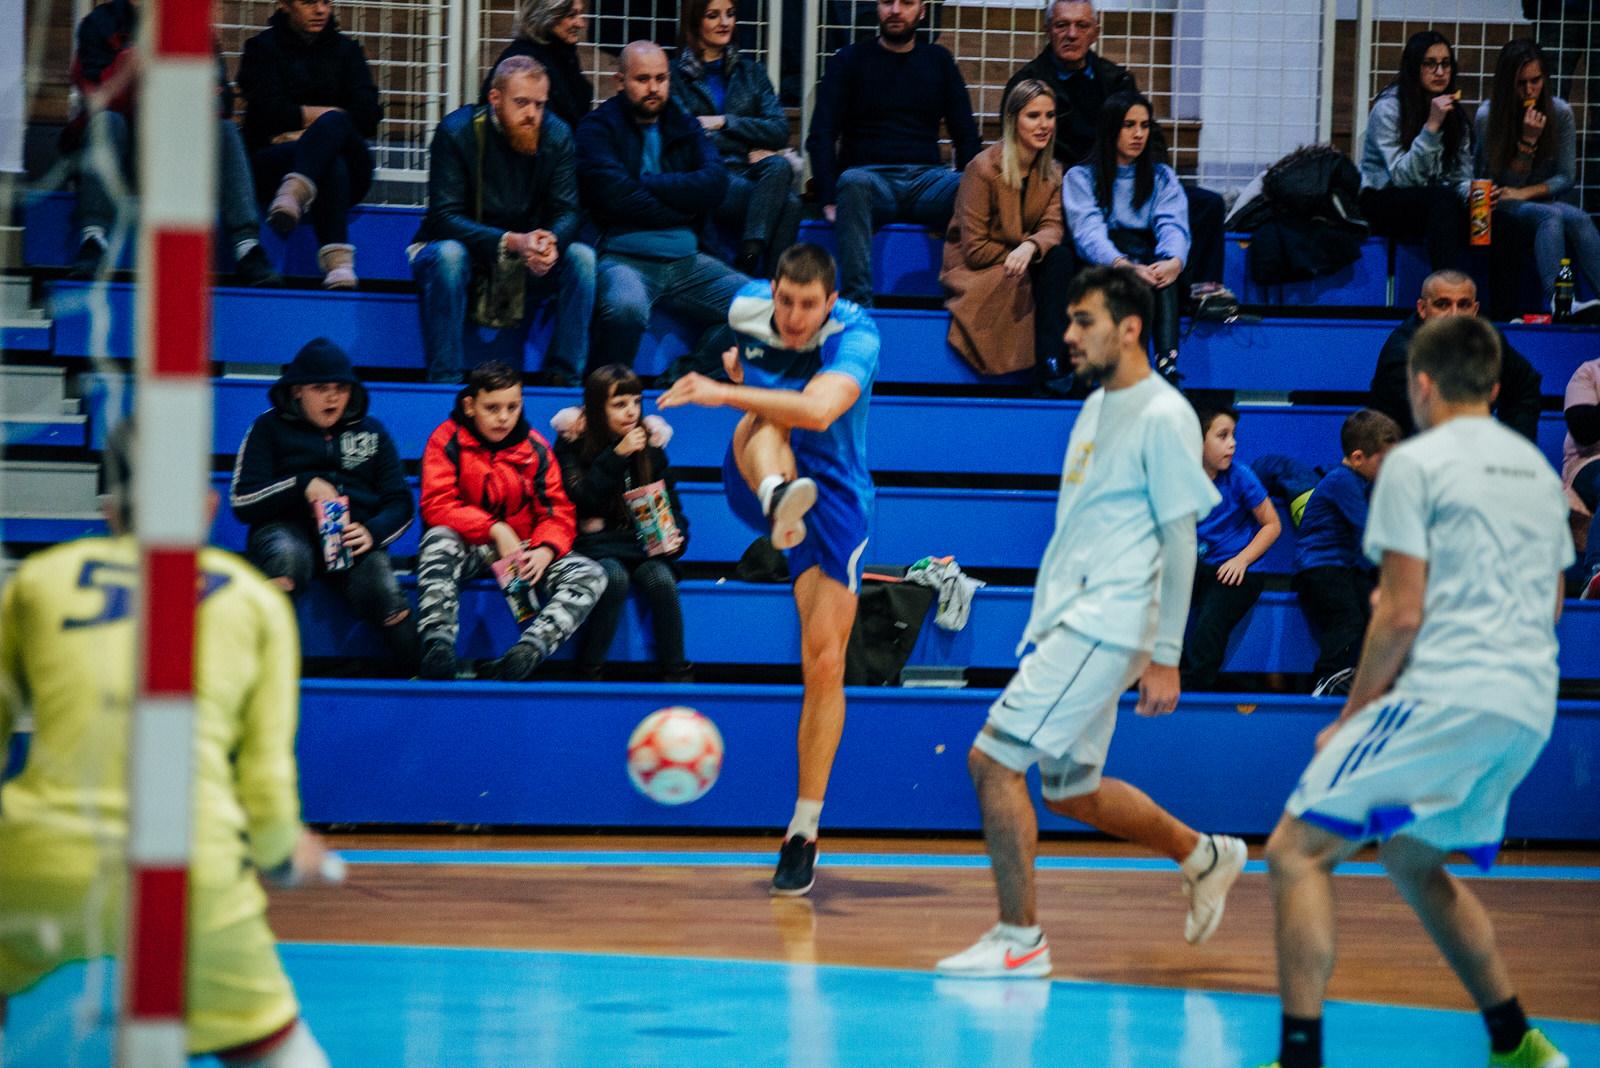 likaclub_otočac_memorijalni-malonogometni-turnir_2019-9